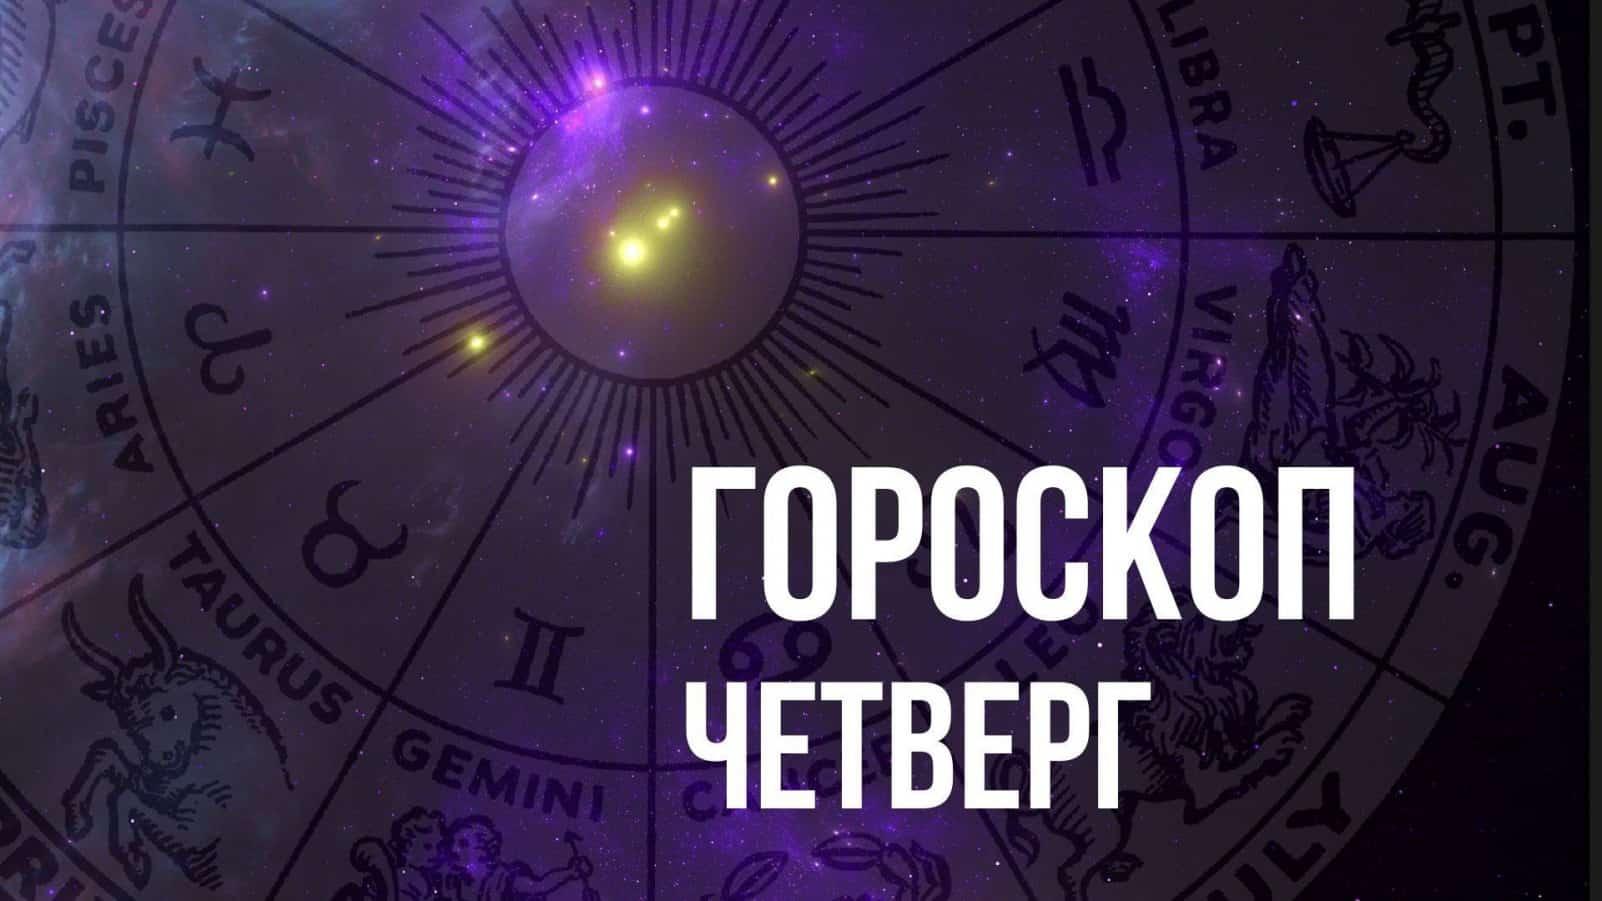 Гороскоп на четверг 13 мая для каждого знака Зодиака